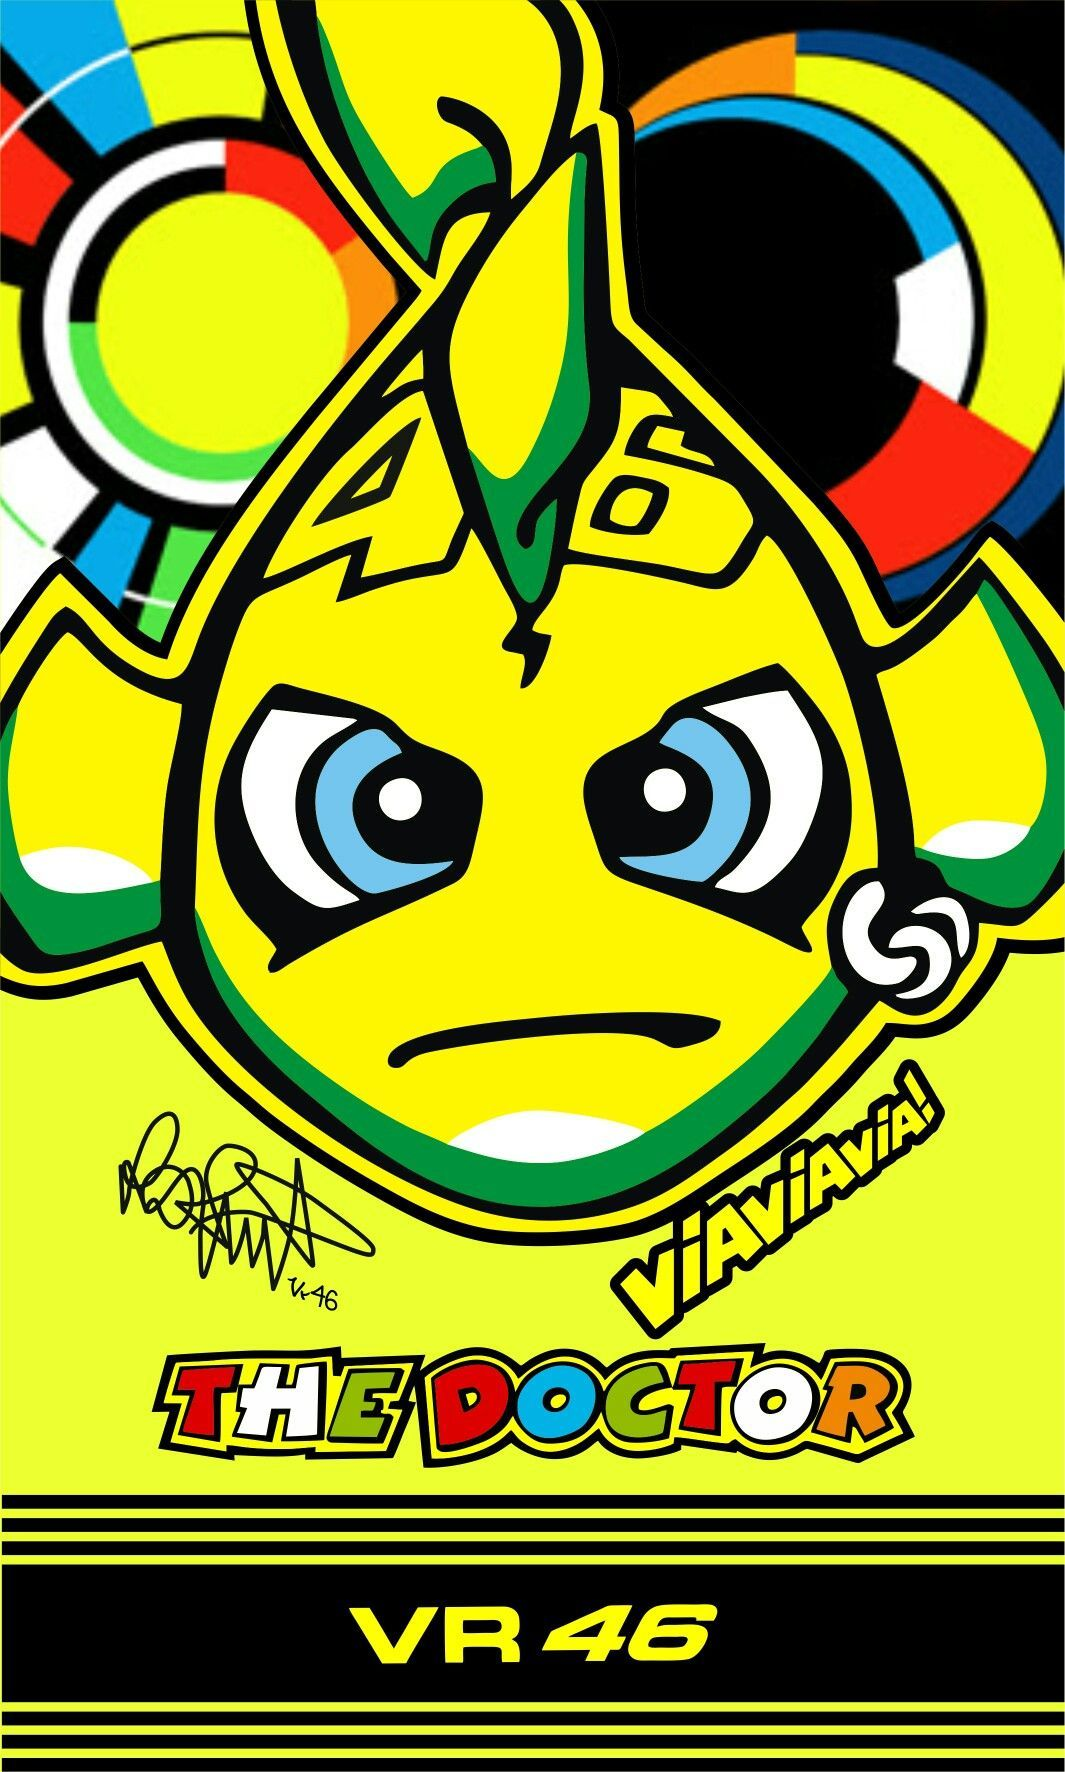 Download Agv Helmets Rossi Moto Valentino Rossi 46 Vr46 Valentino Rossi And Share It Wit Valentino Rossi Logo Vr46 Valentino Rossi Valentino Rossi Yamaha